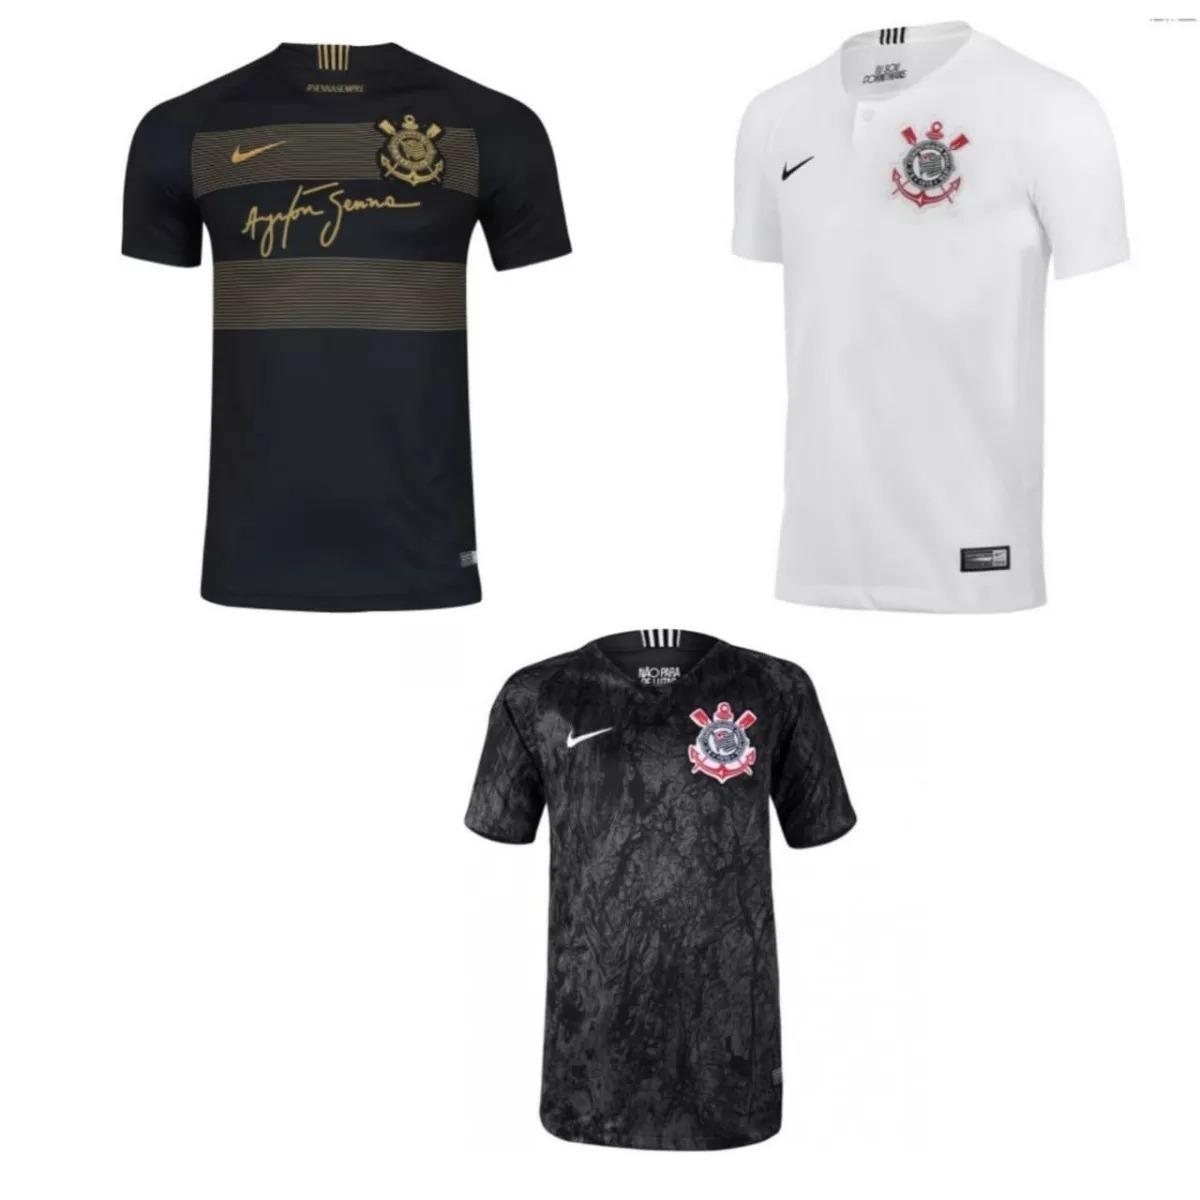 Kit 3 Camisa Corinthians Temporada 2019 Mega Oferta 40% Off - R  178 ... 778bf8e0f7f03